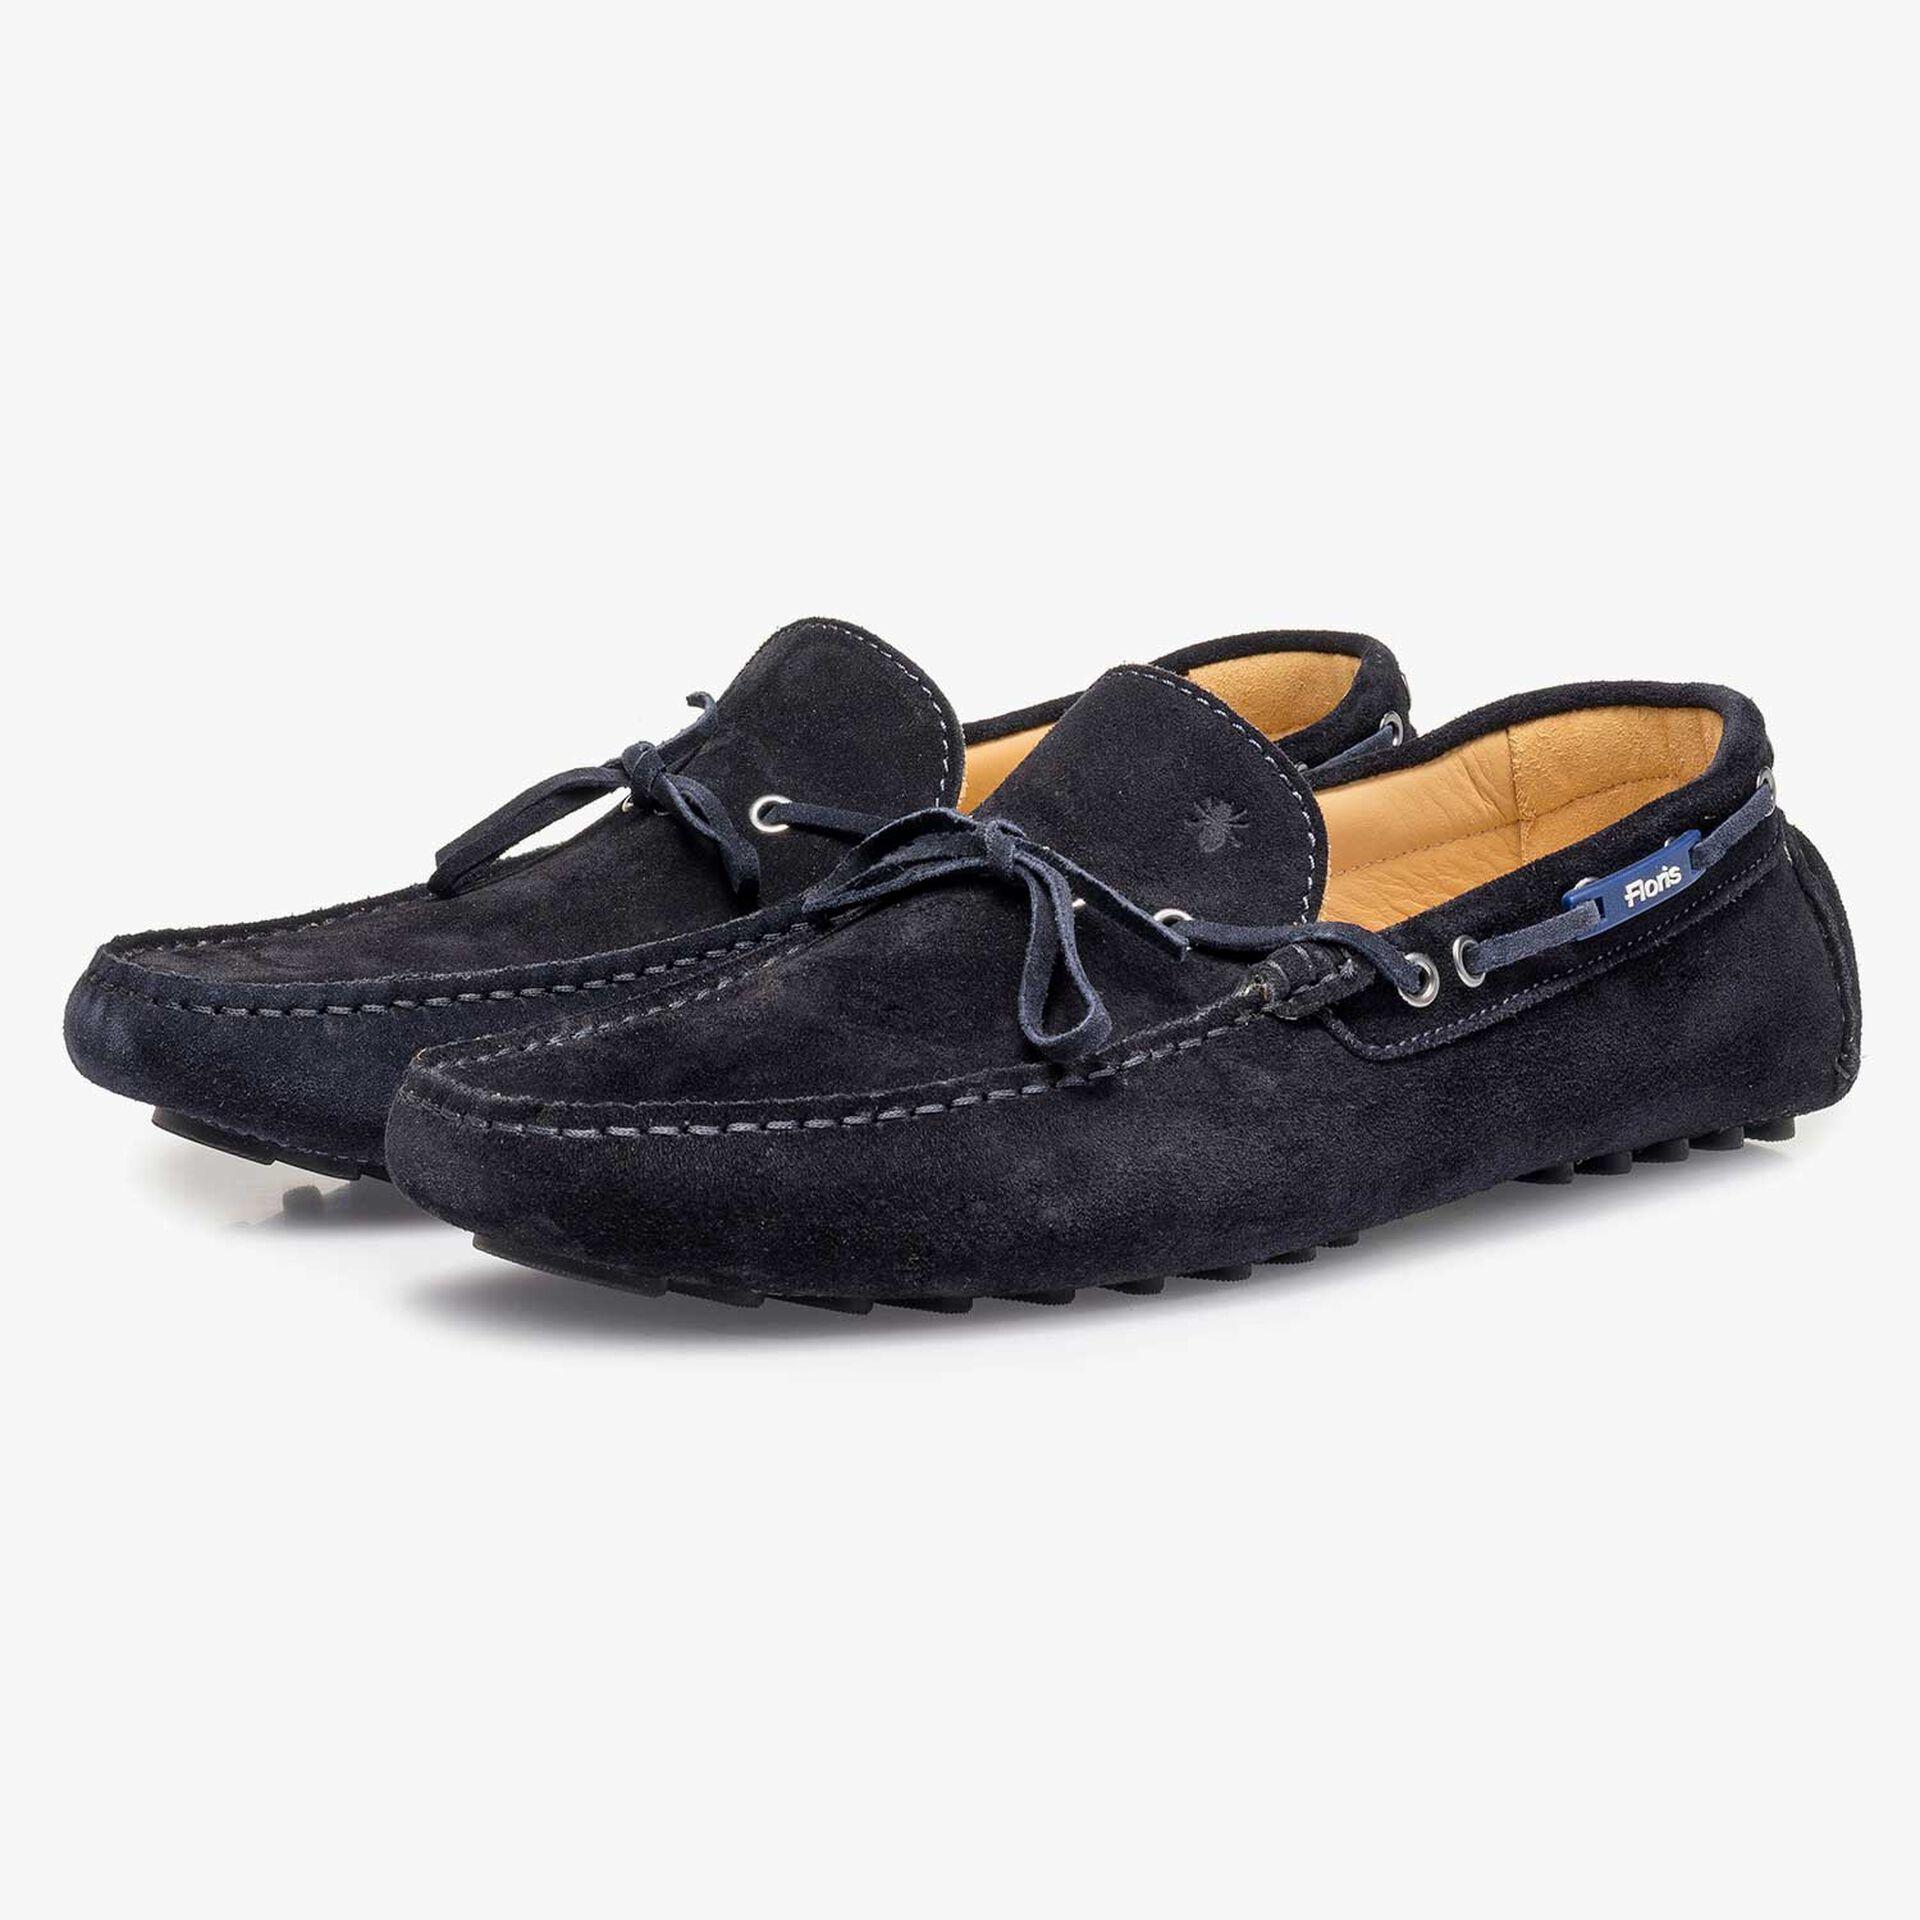 Dark blue calf suede leather moccasin